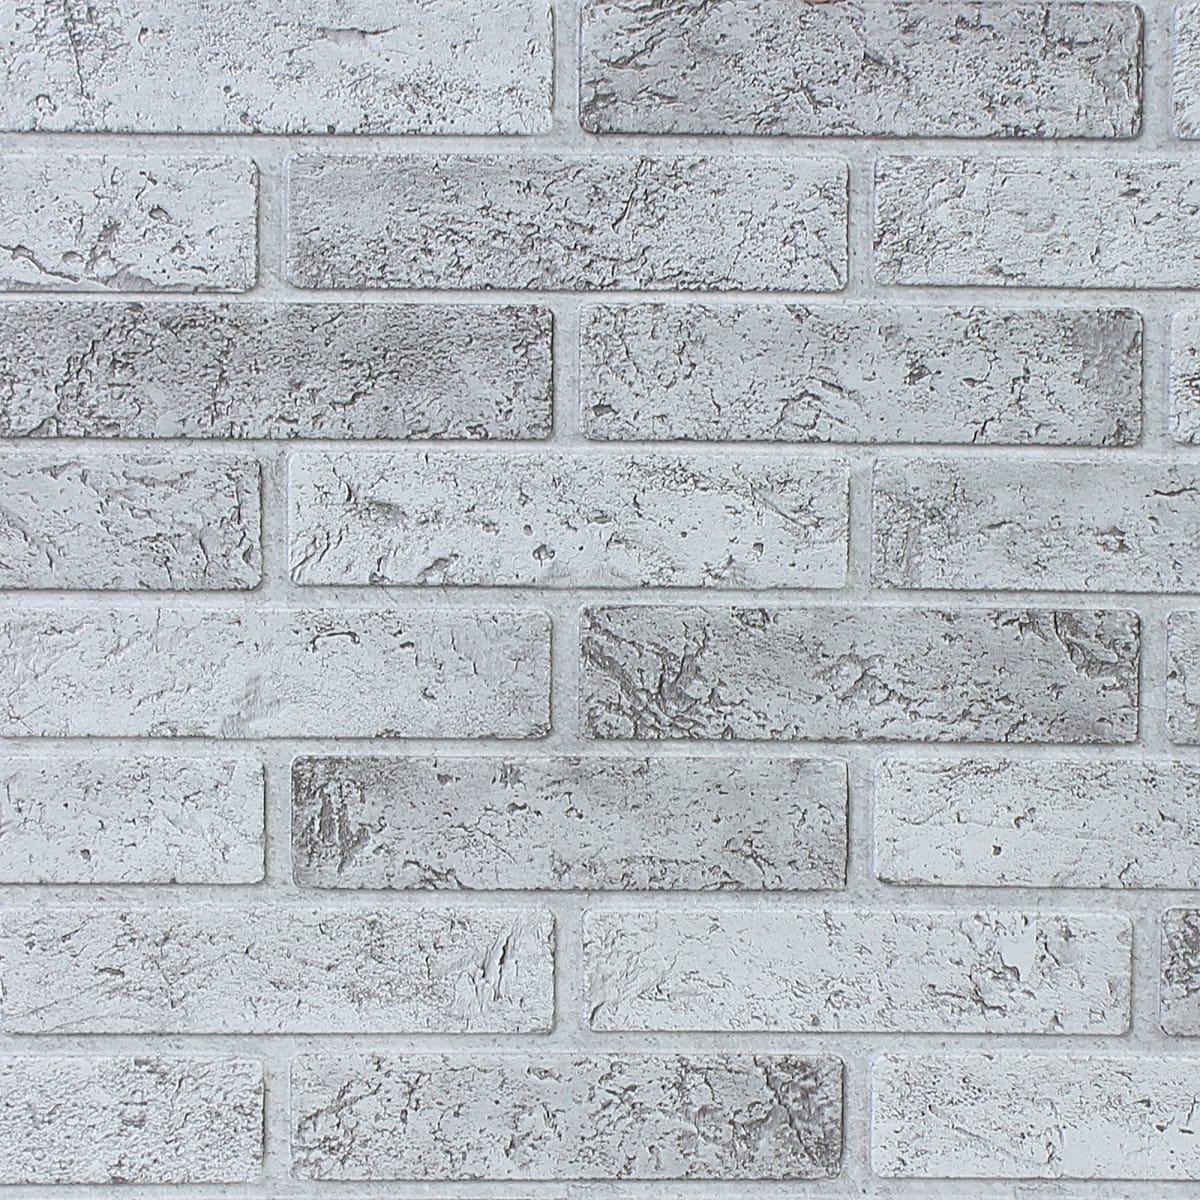 Панель ПВХ листовая 3 мм 962х499 мм Кирпич серый 0.48 м²